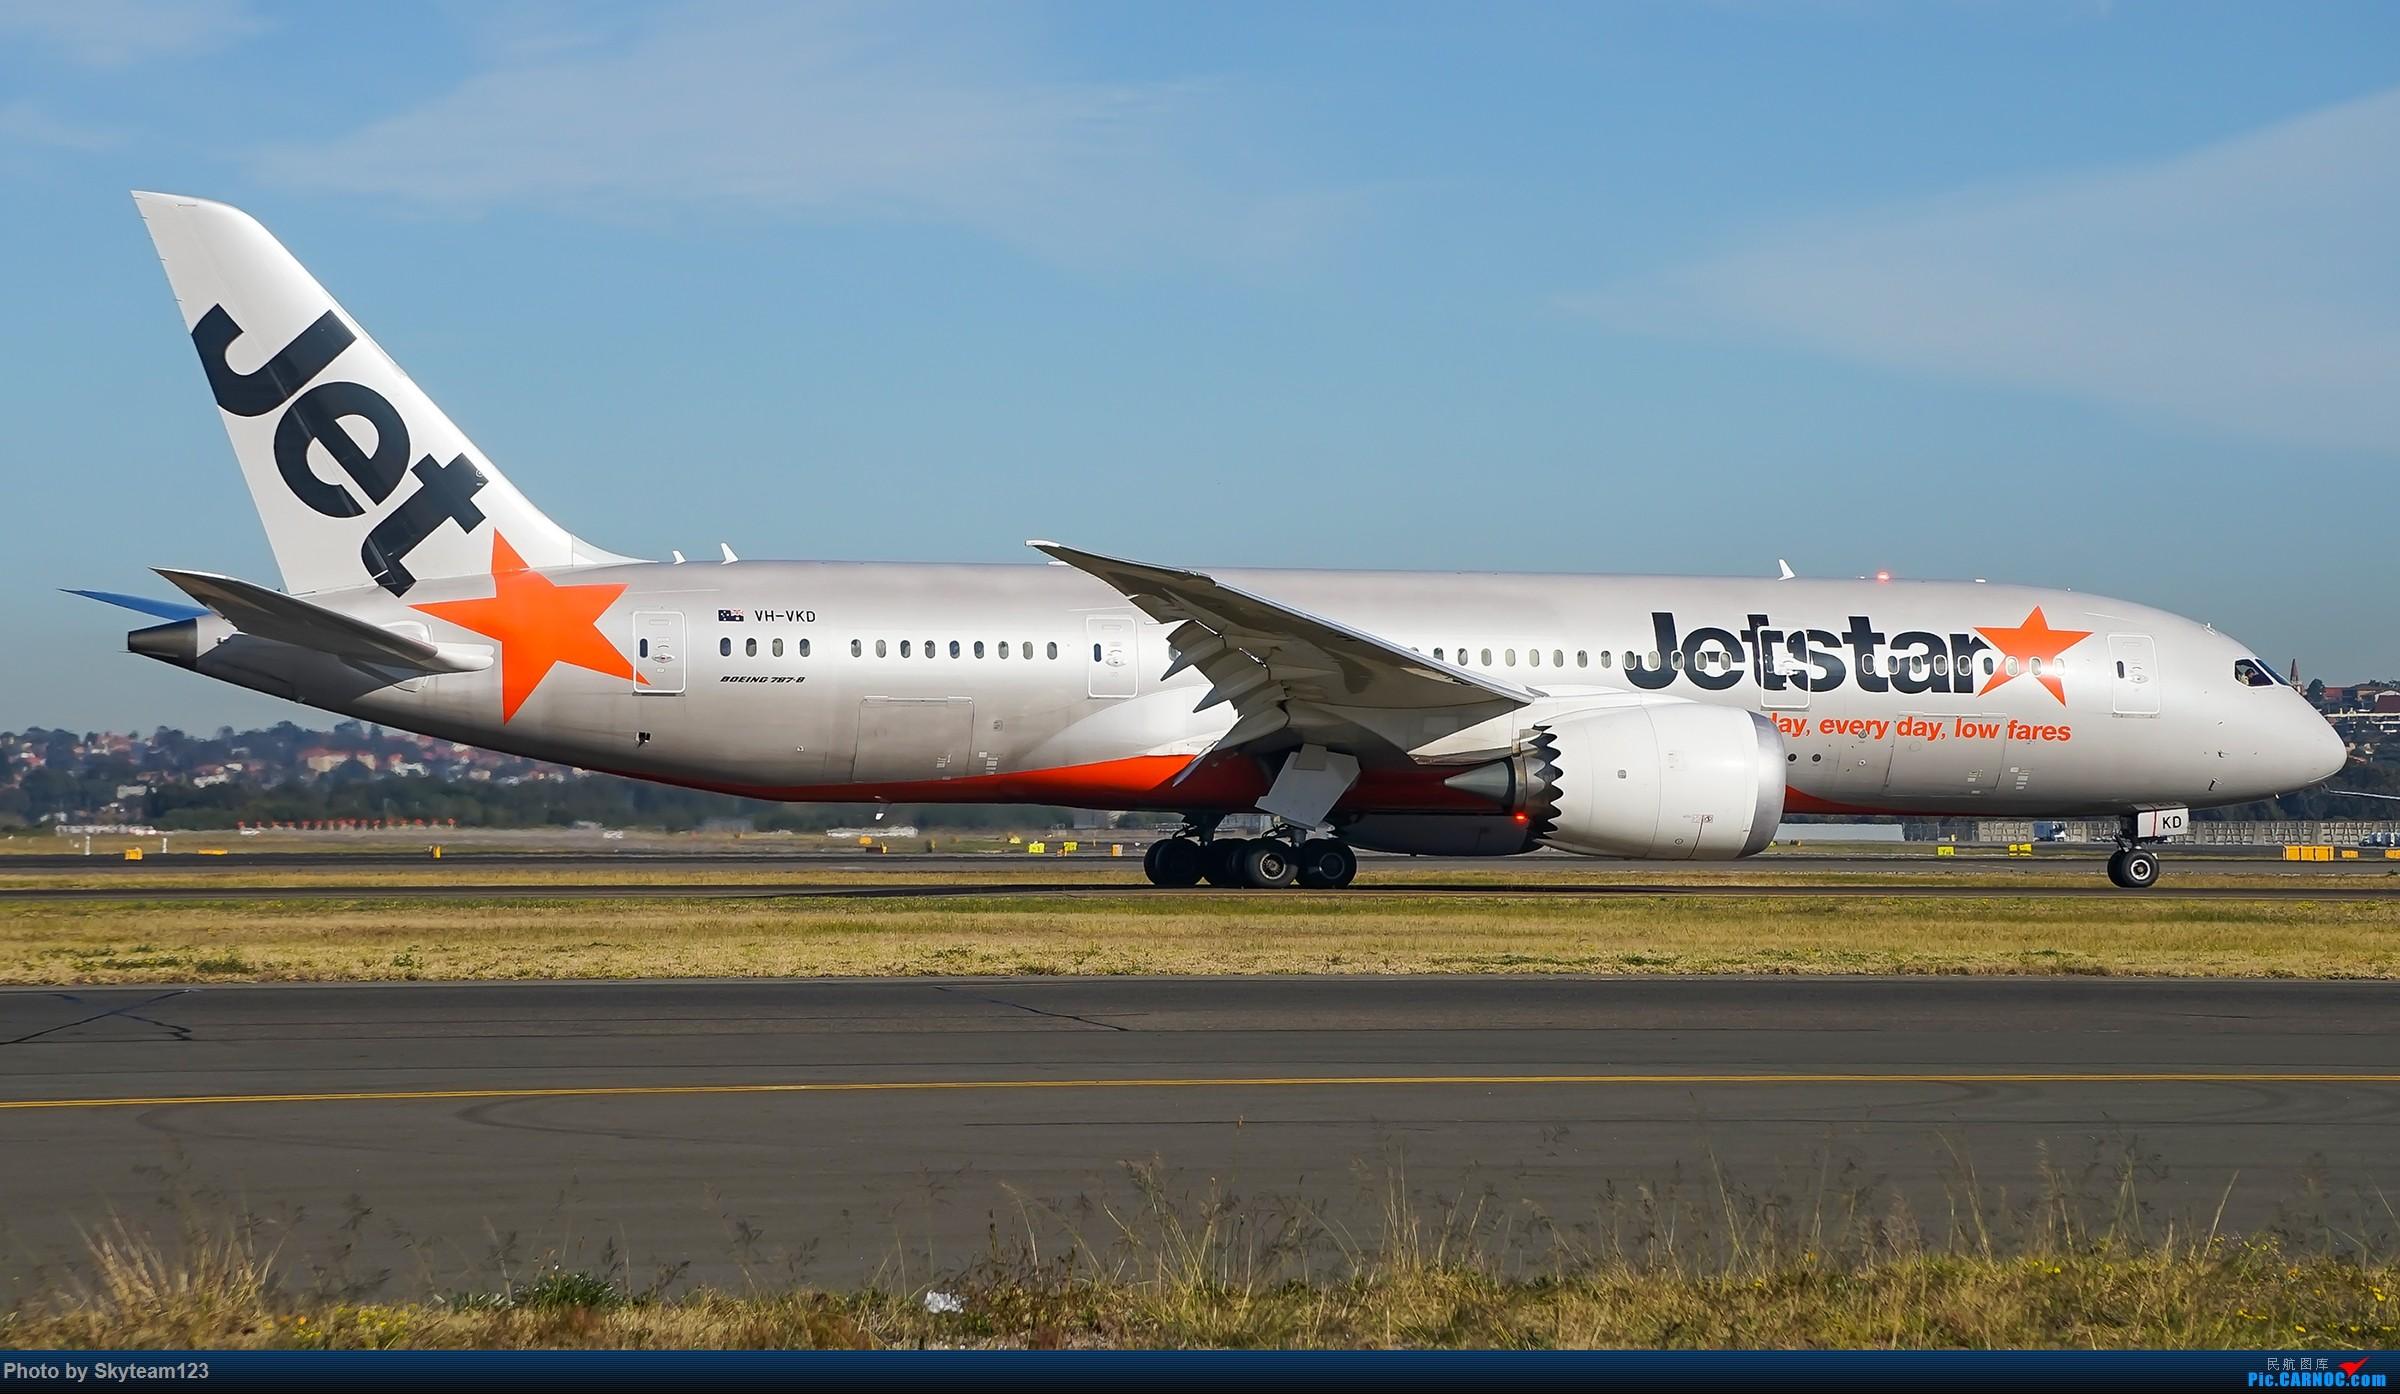 Re:[原创][SYD] 再访Blu EMU停车场 早上34L抵港出发杂图几张 BOEING 787-8 VH-VKD 澳大利亚悉尼金斯福德·史密斯机场